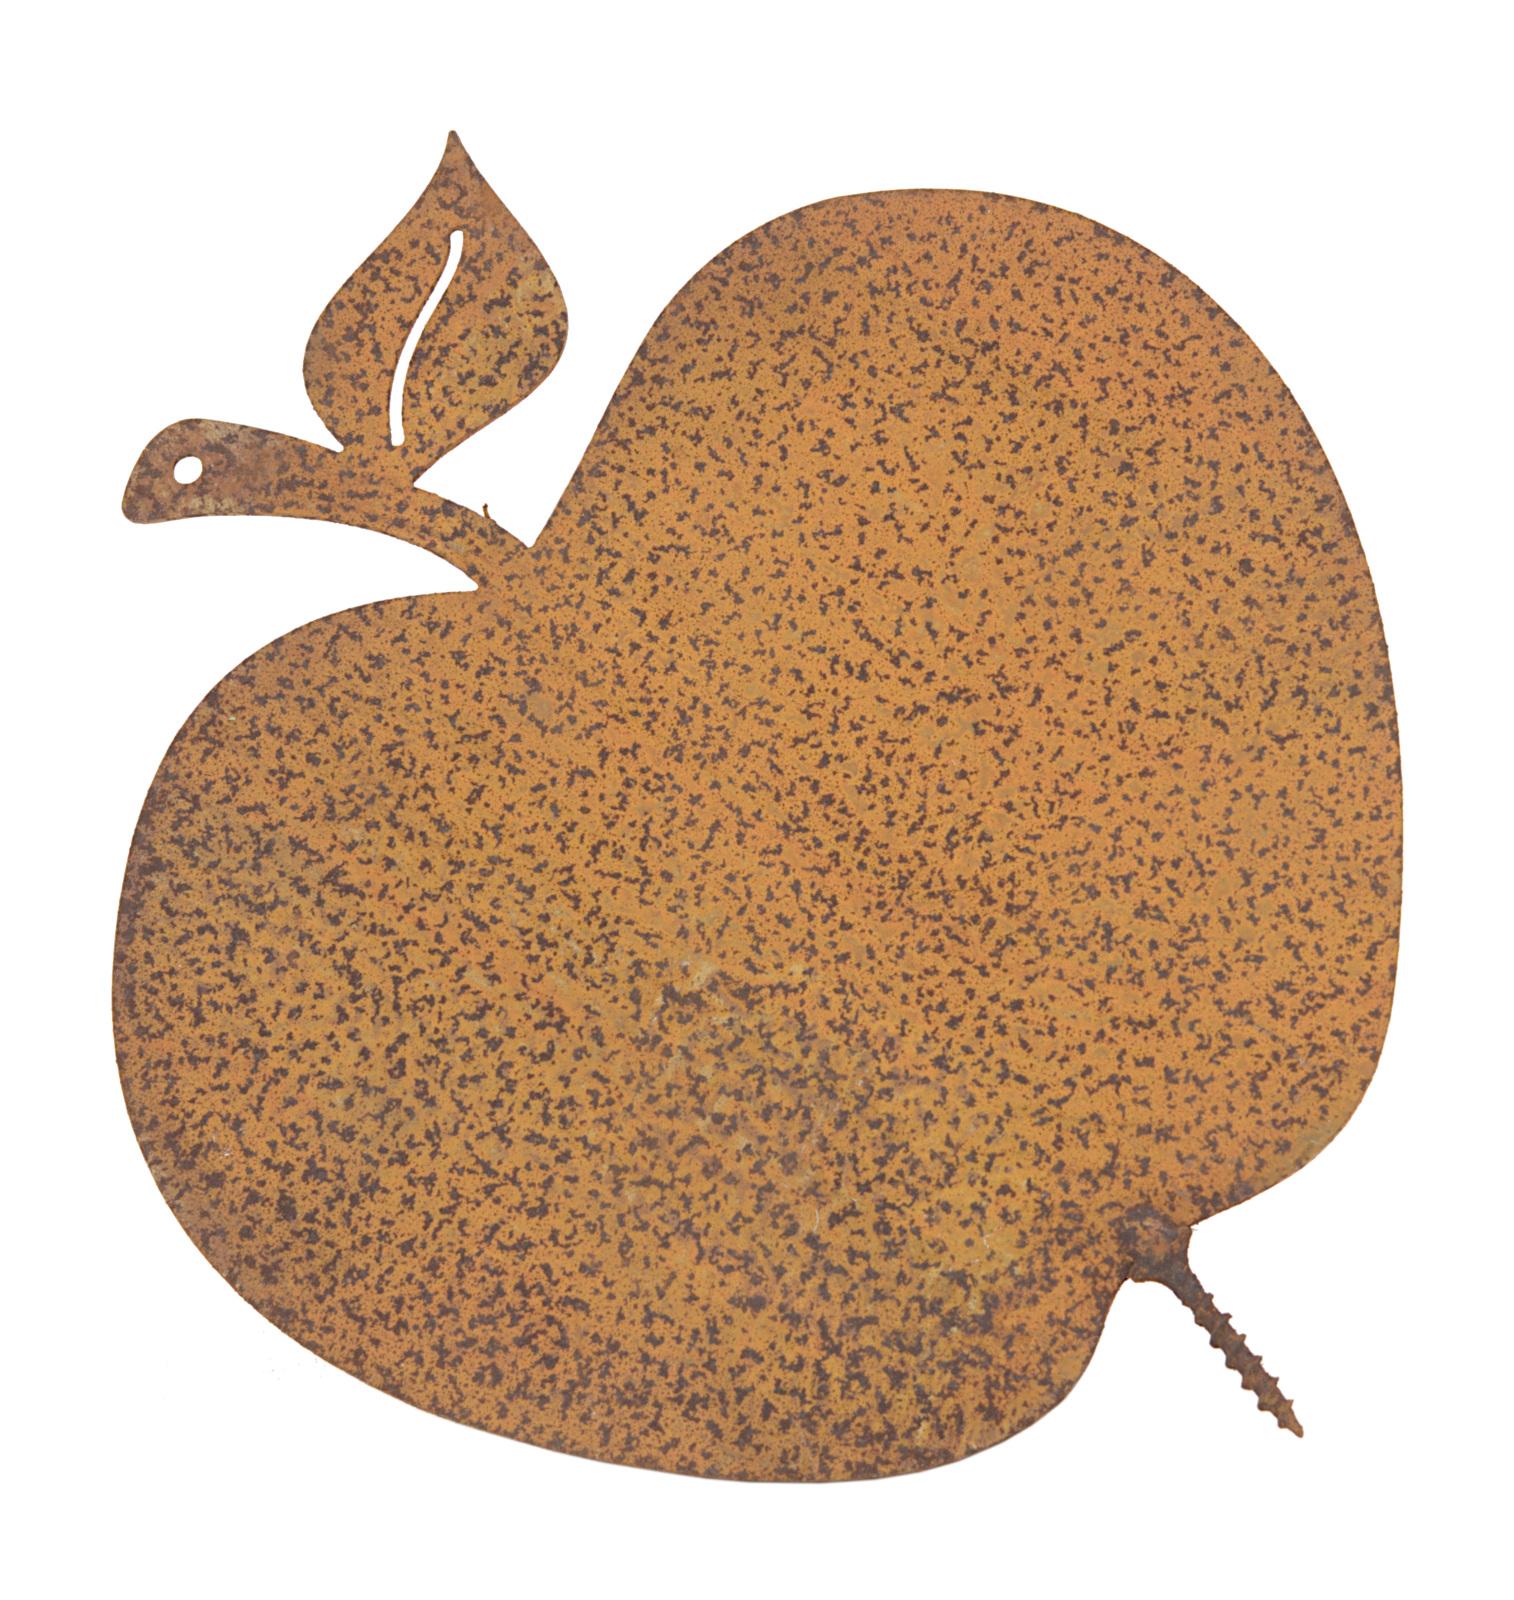 Gartendekoration Gartendeko Apfel mit Dorn Schraube Baumdeko Metall Rost Deko